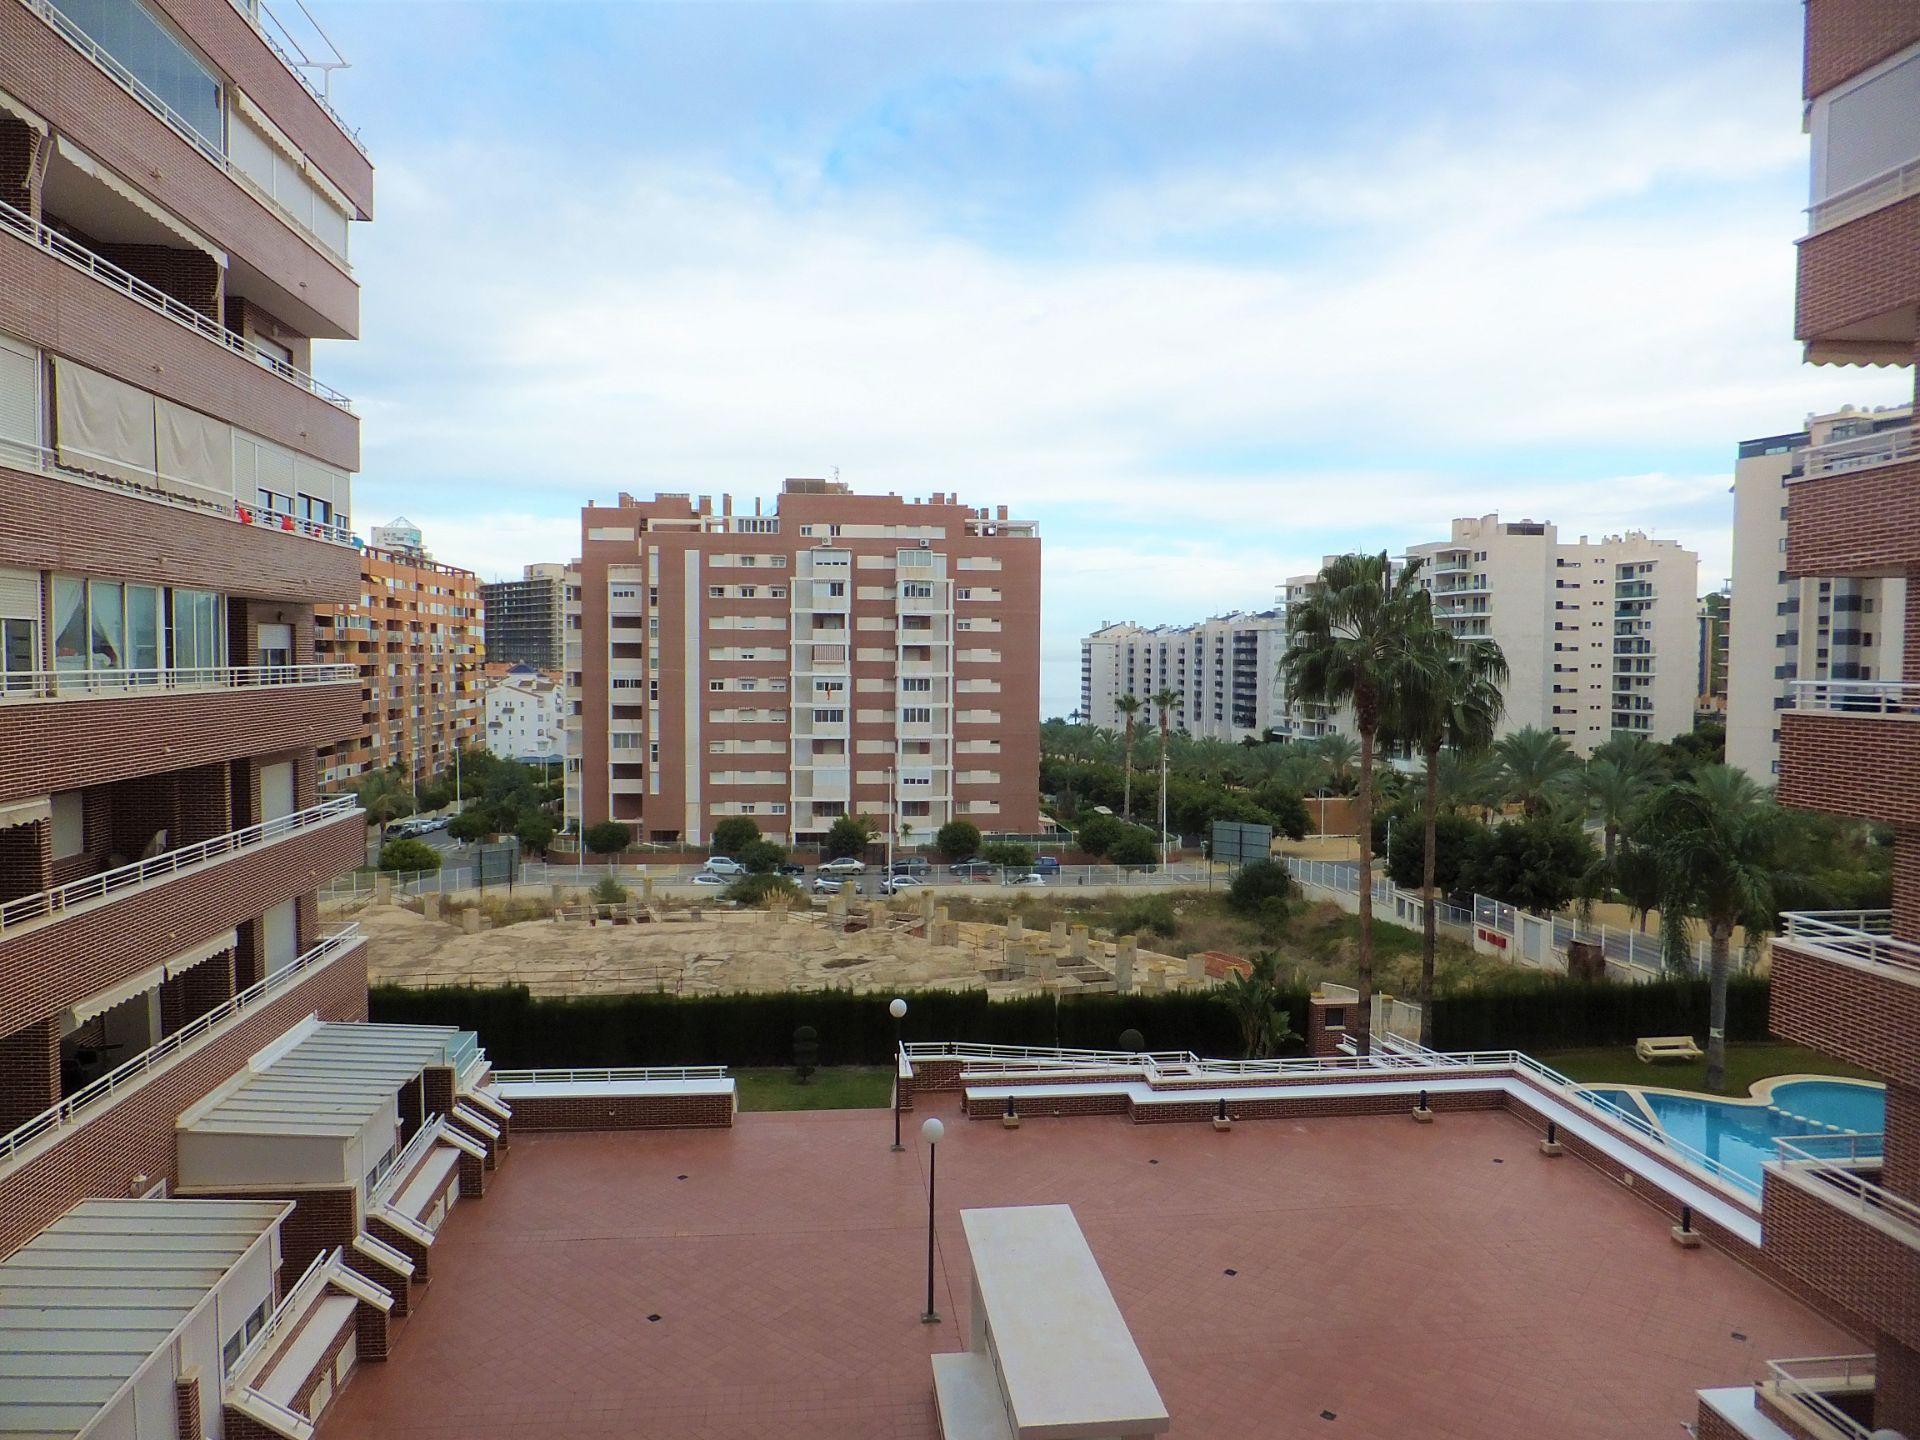 Apartamento en Villajoyosa, Cala de Villajoyosa, alquiler